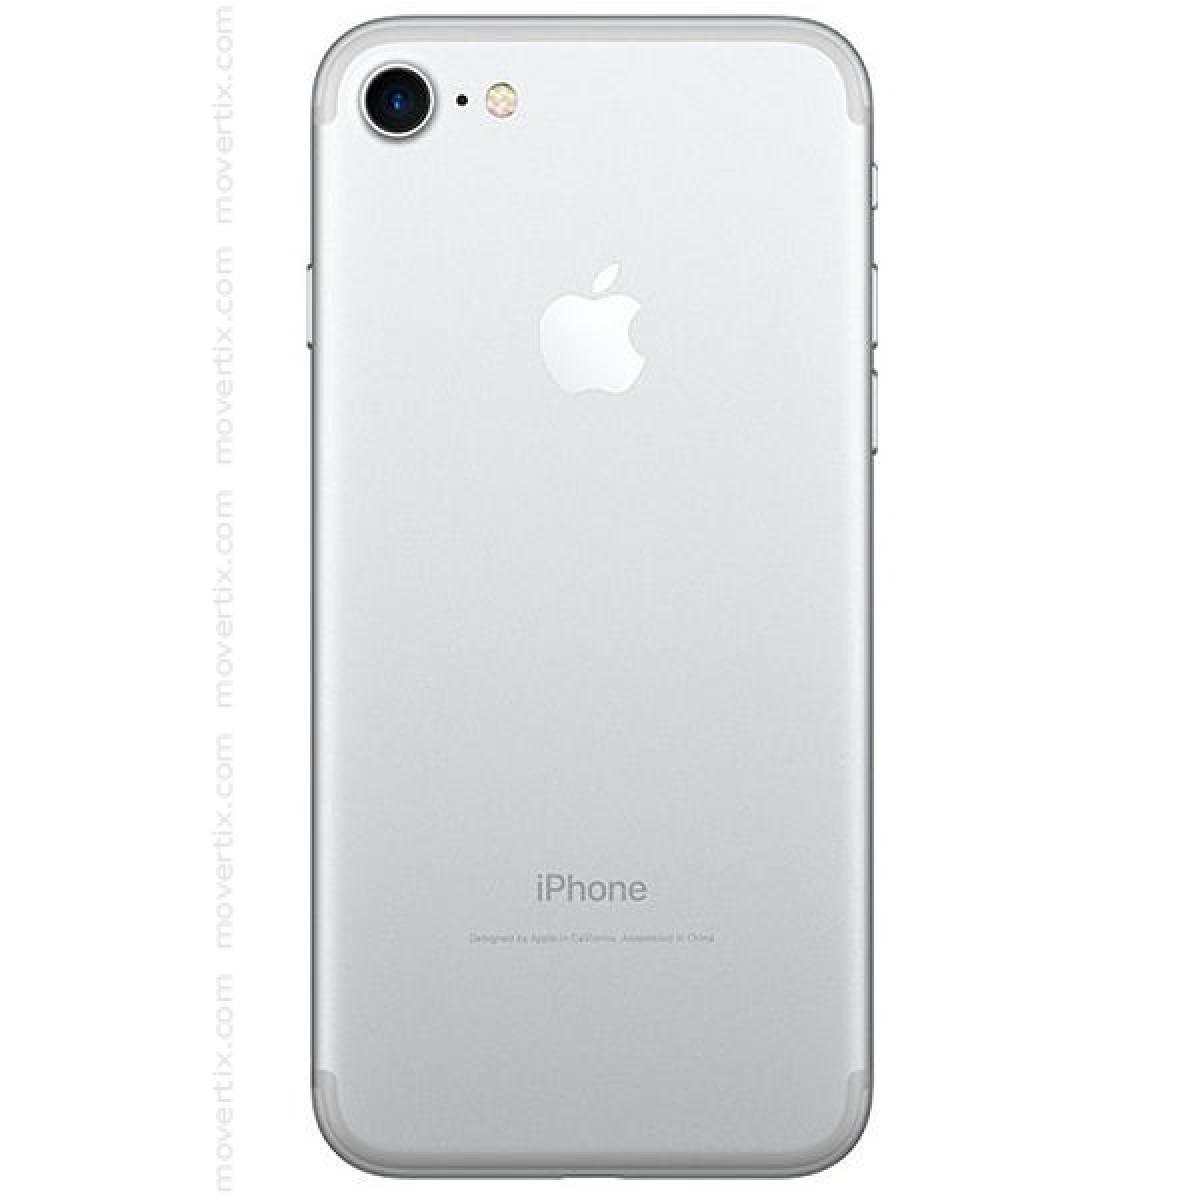 apple iphone 7 silver 256gb 190198070692 movertix mobile phones shop. Black Bedroom Furniture Sets. Home Design Ideas